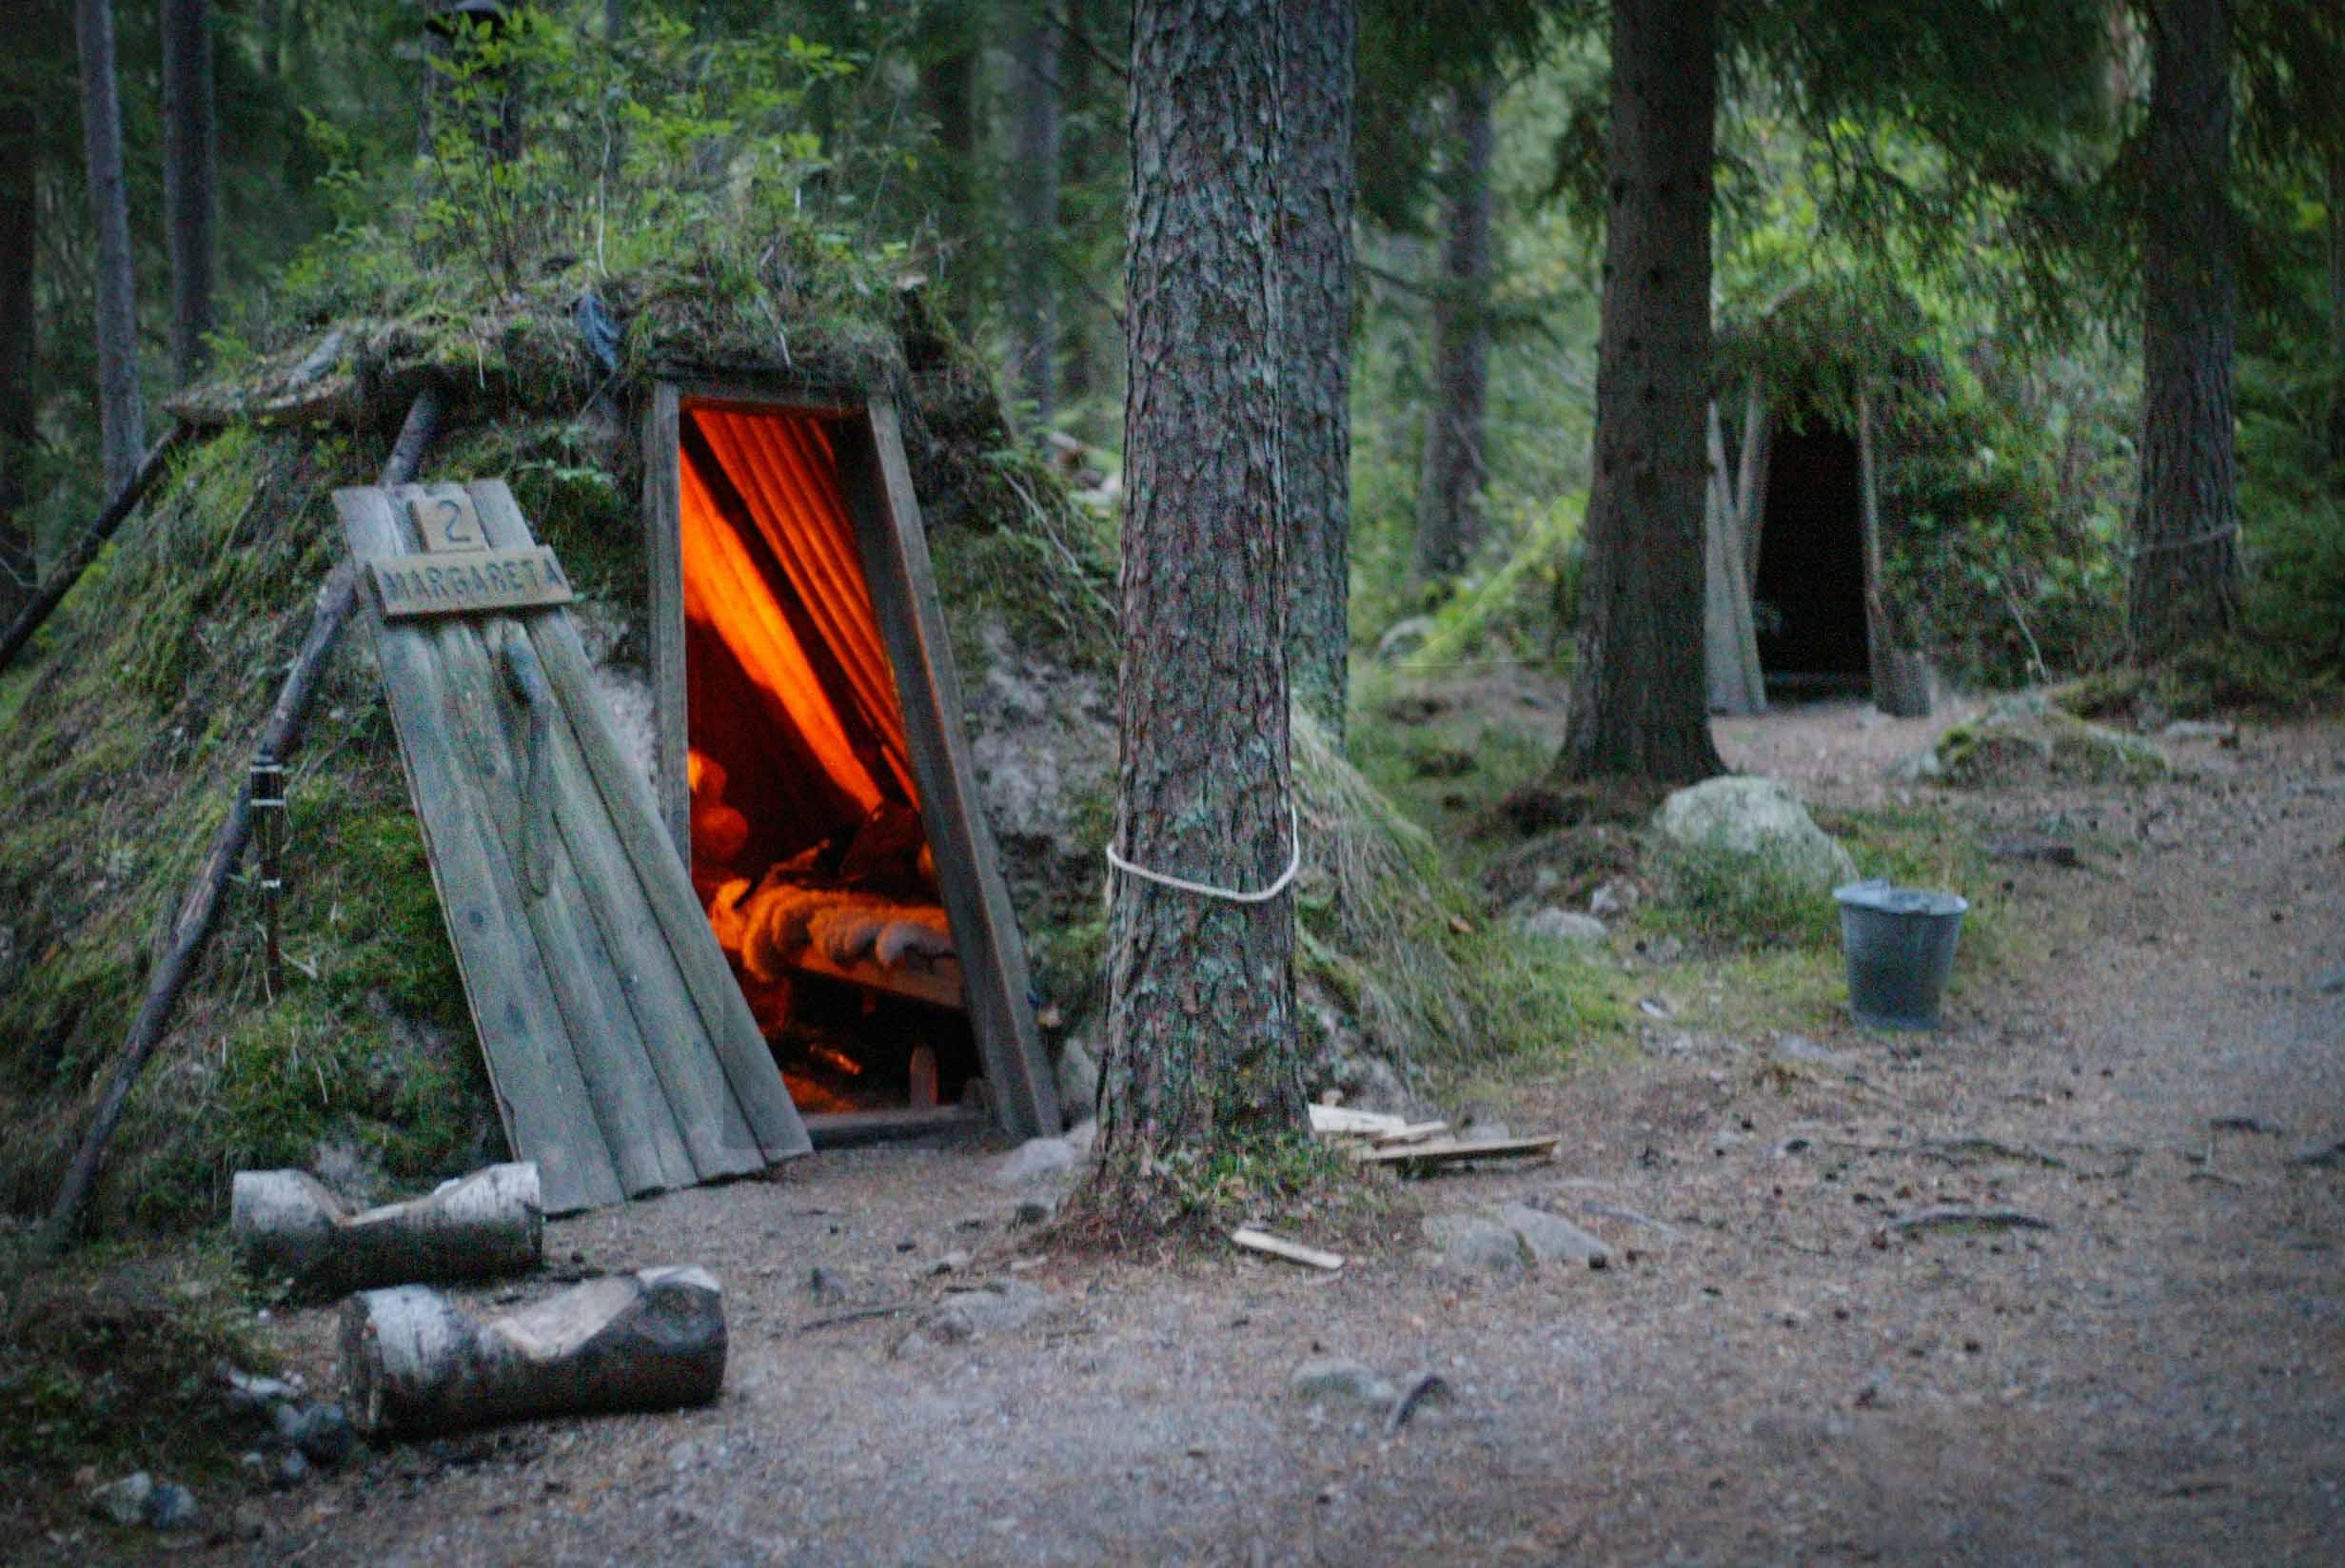 kolarbyn_ecolodge_sweden_15_2